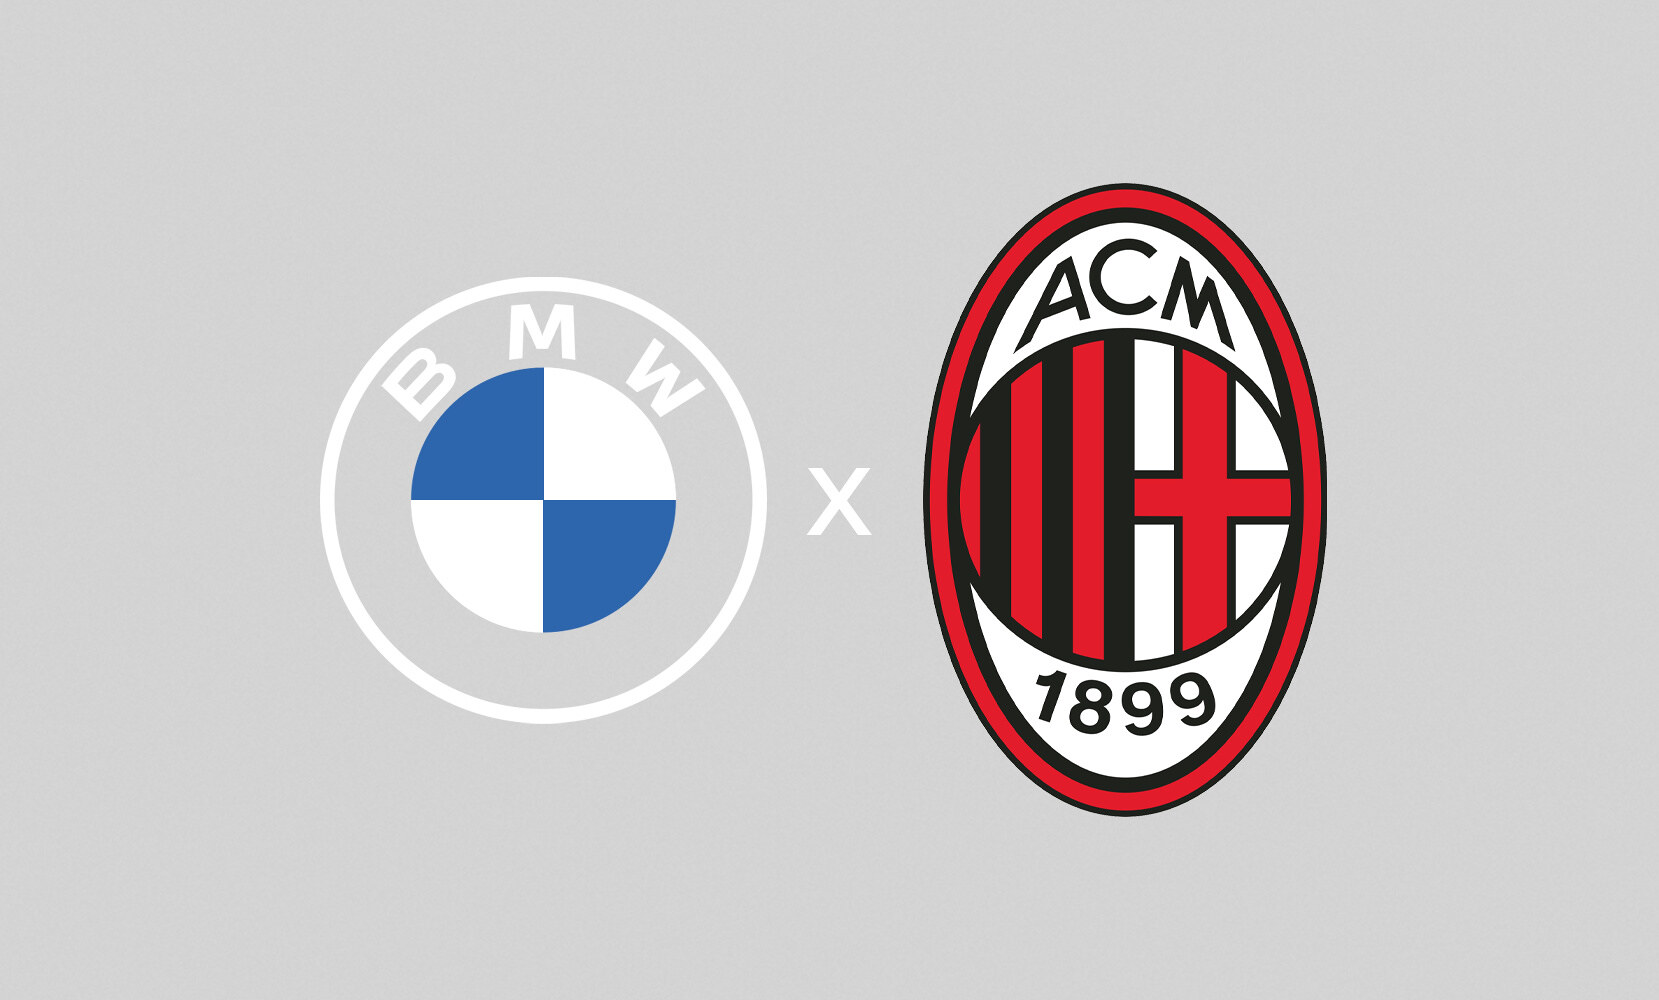 BMW x A.C. Milan